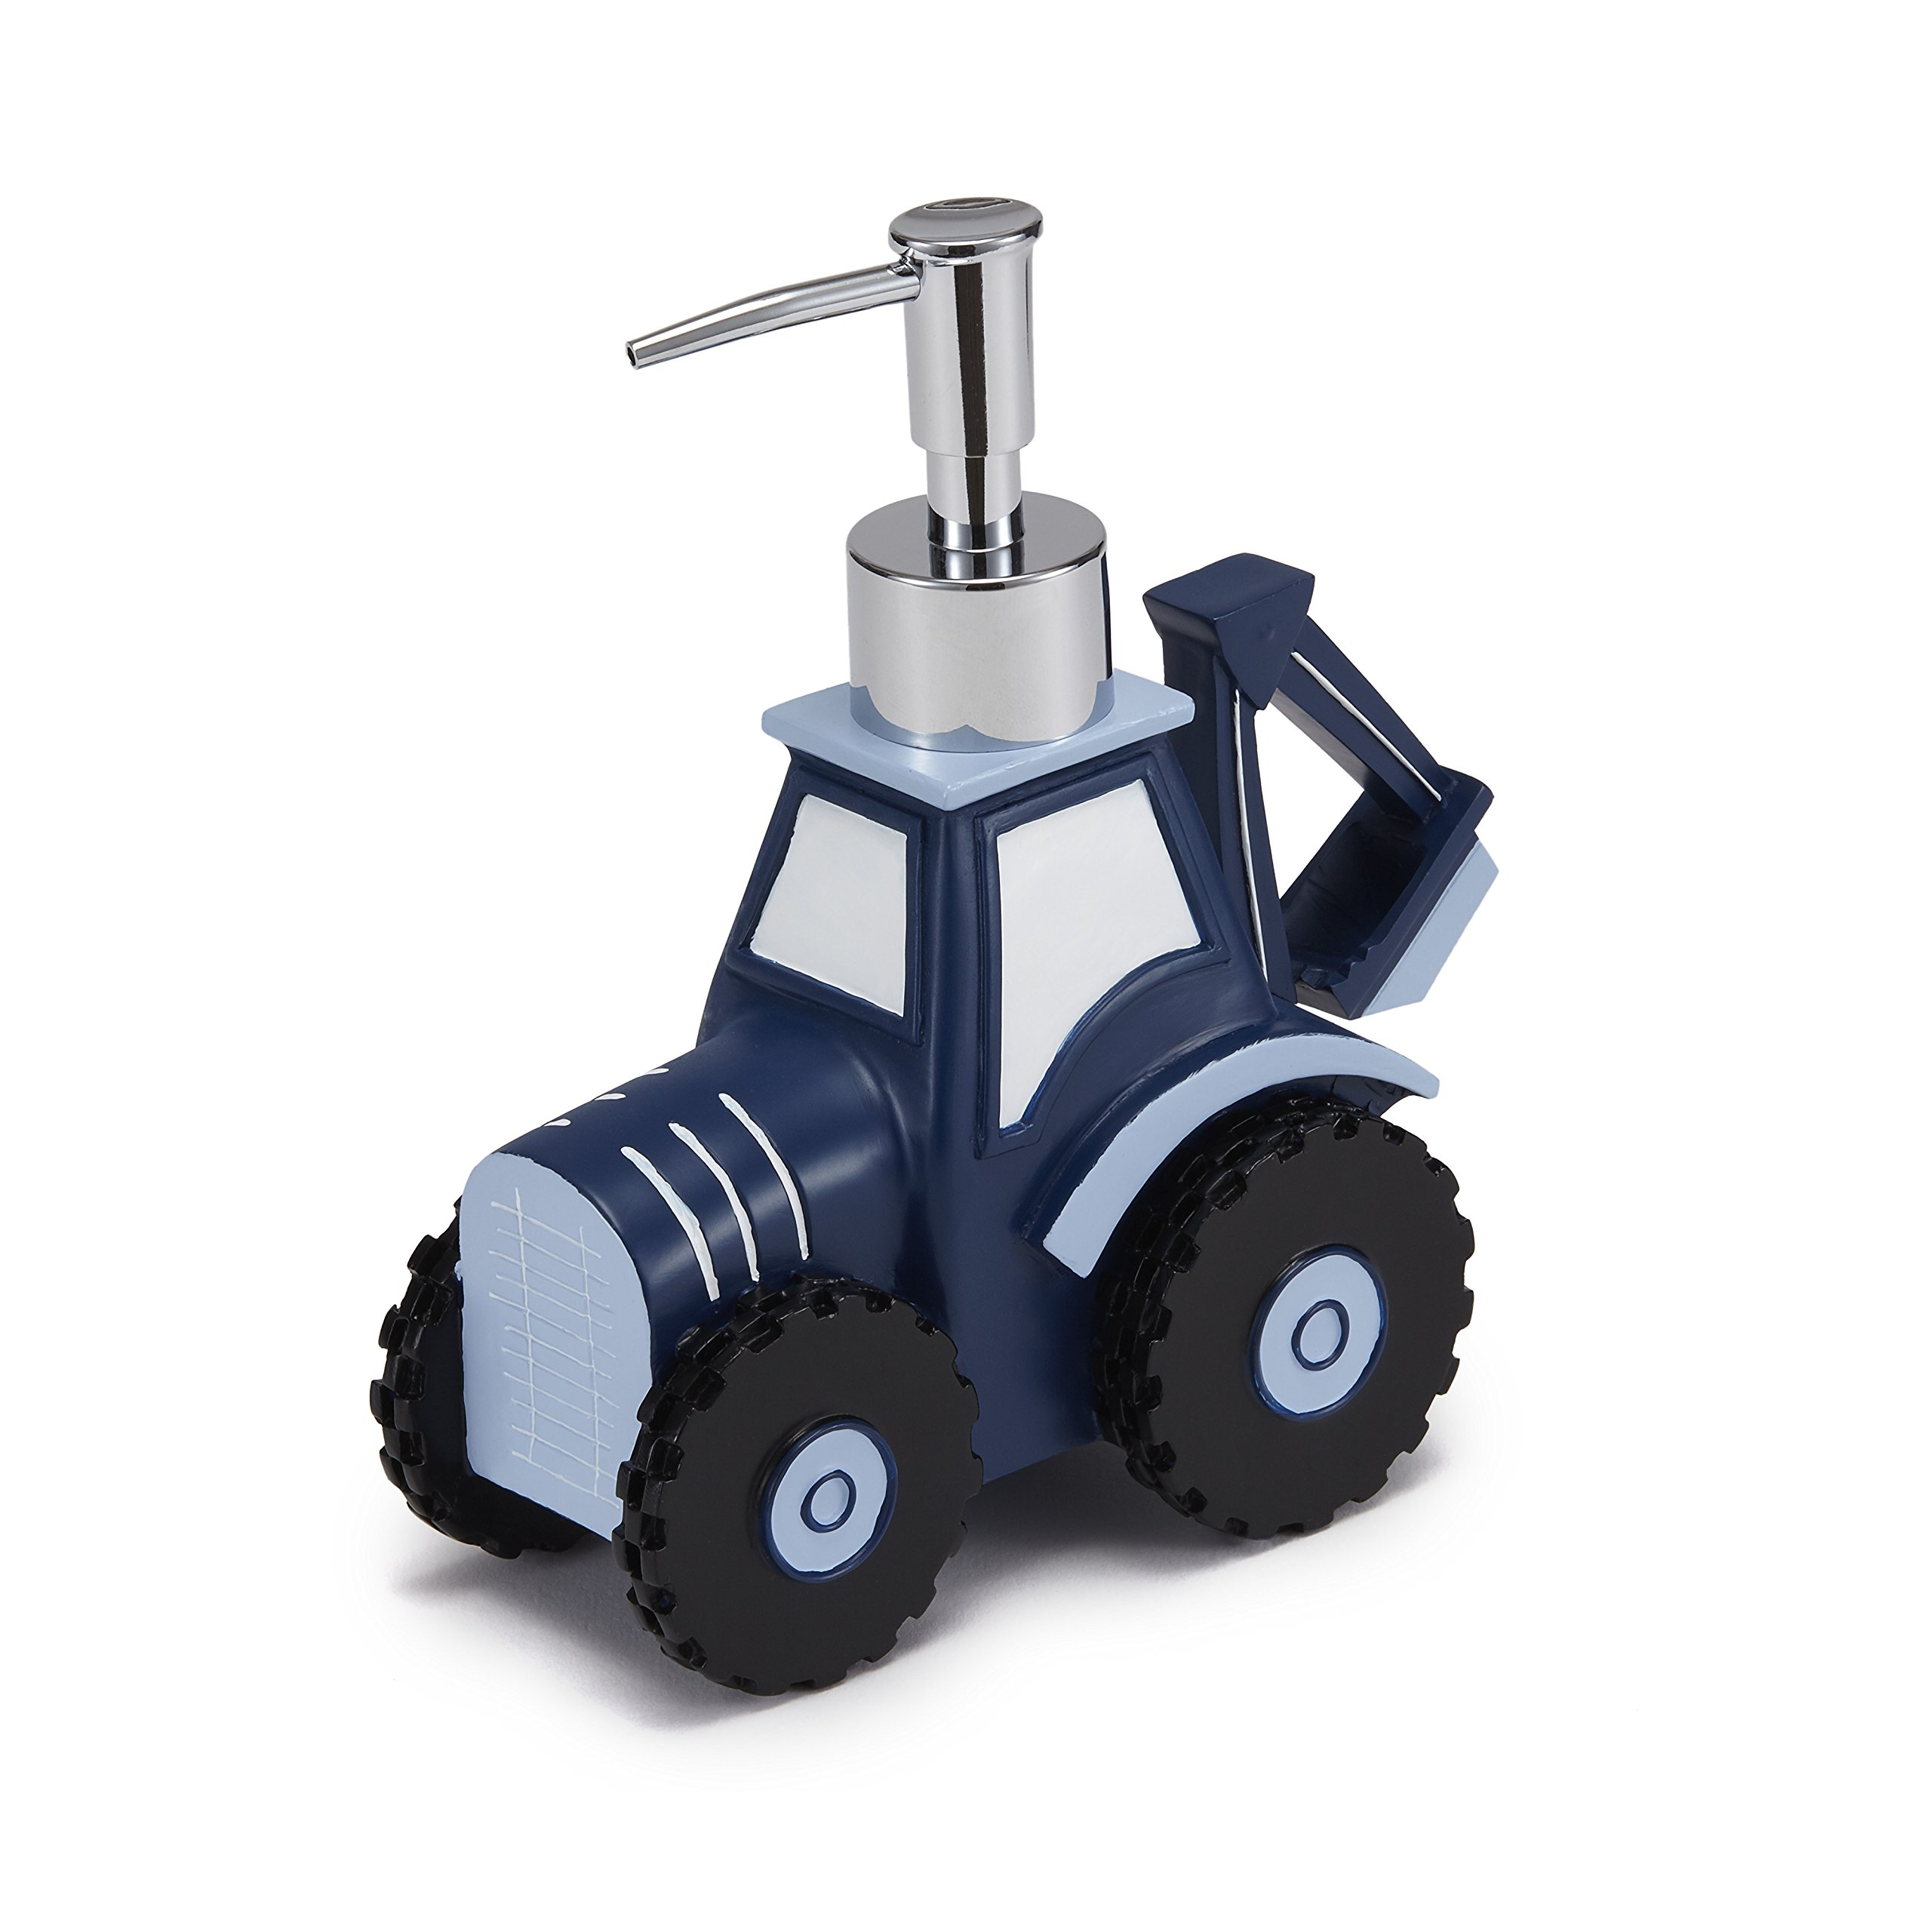 Kassatex Construction Bath Accessories Lotion Dispenser, One Size, Blue, White